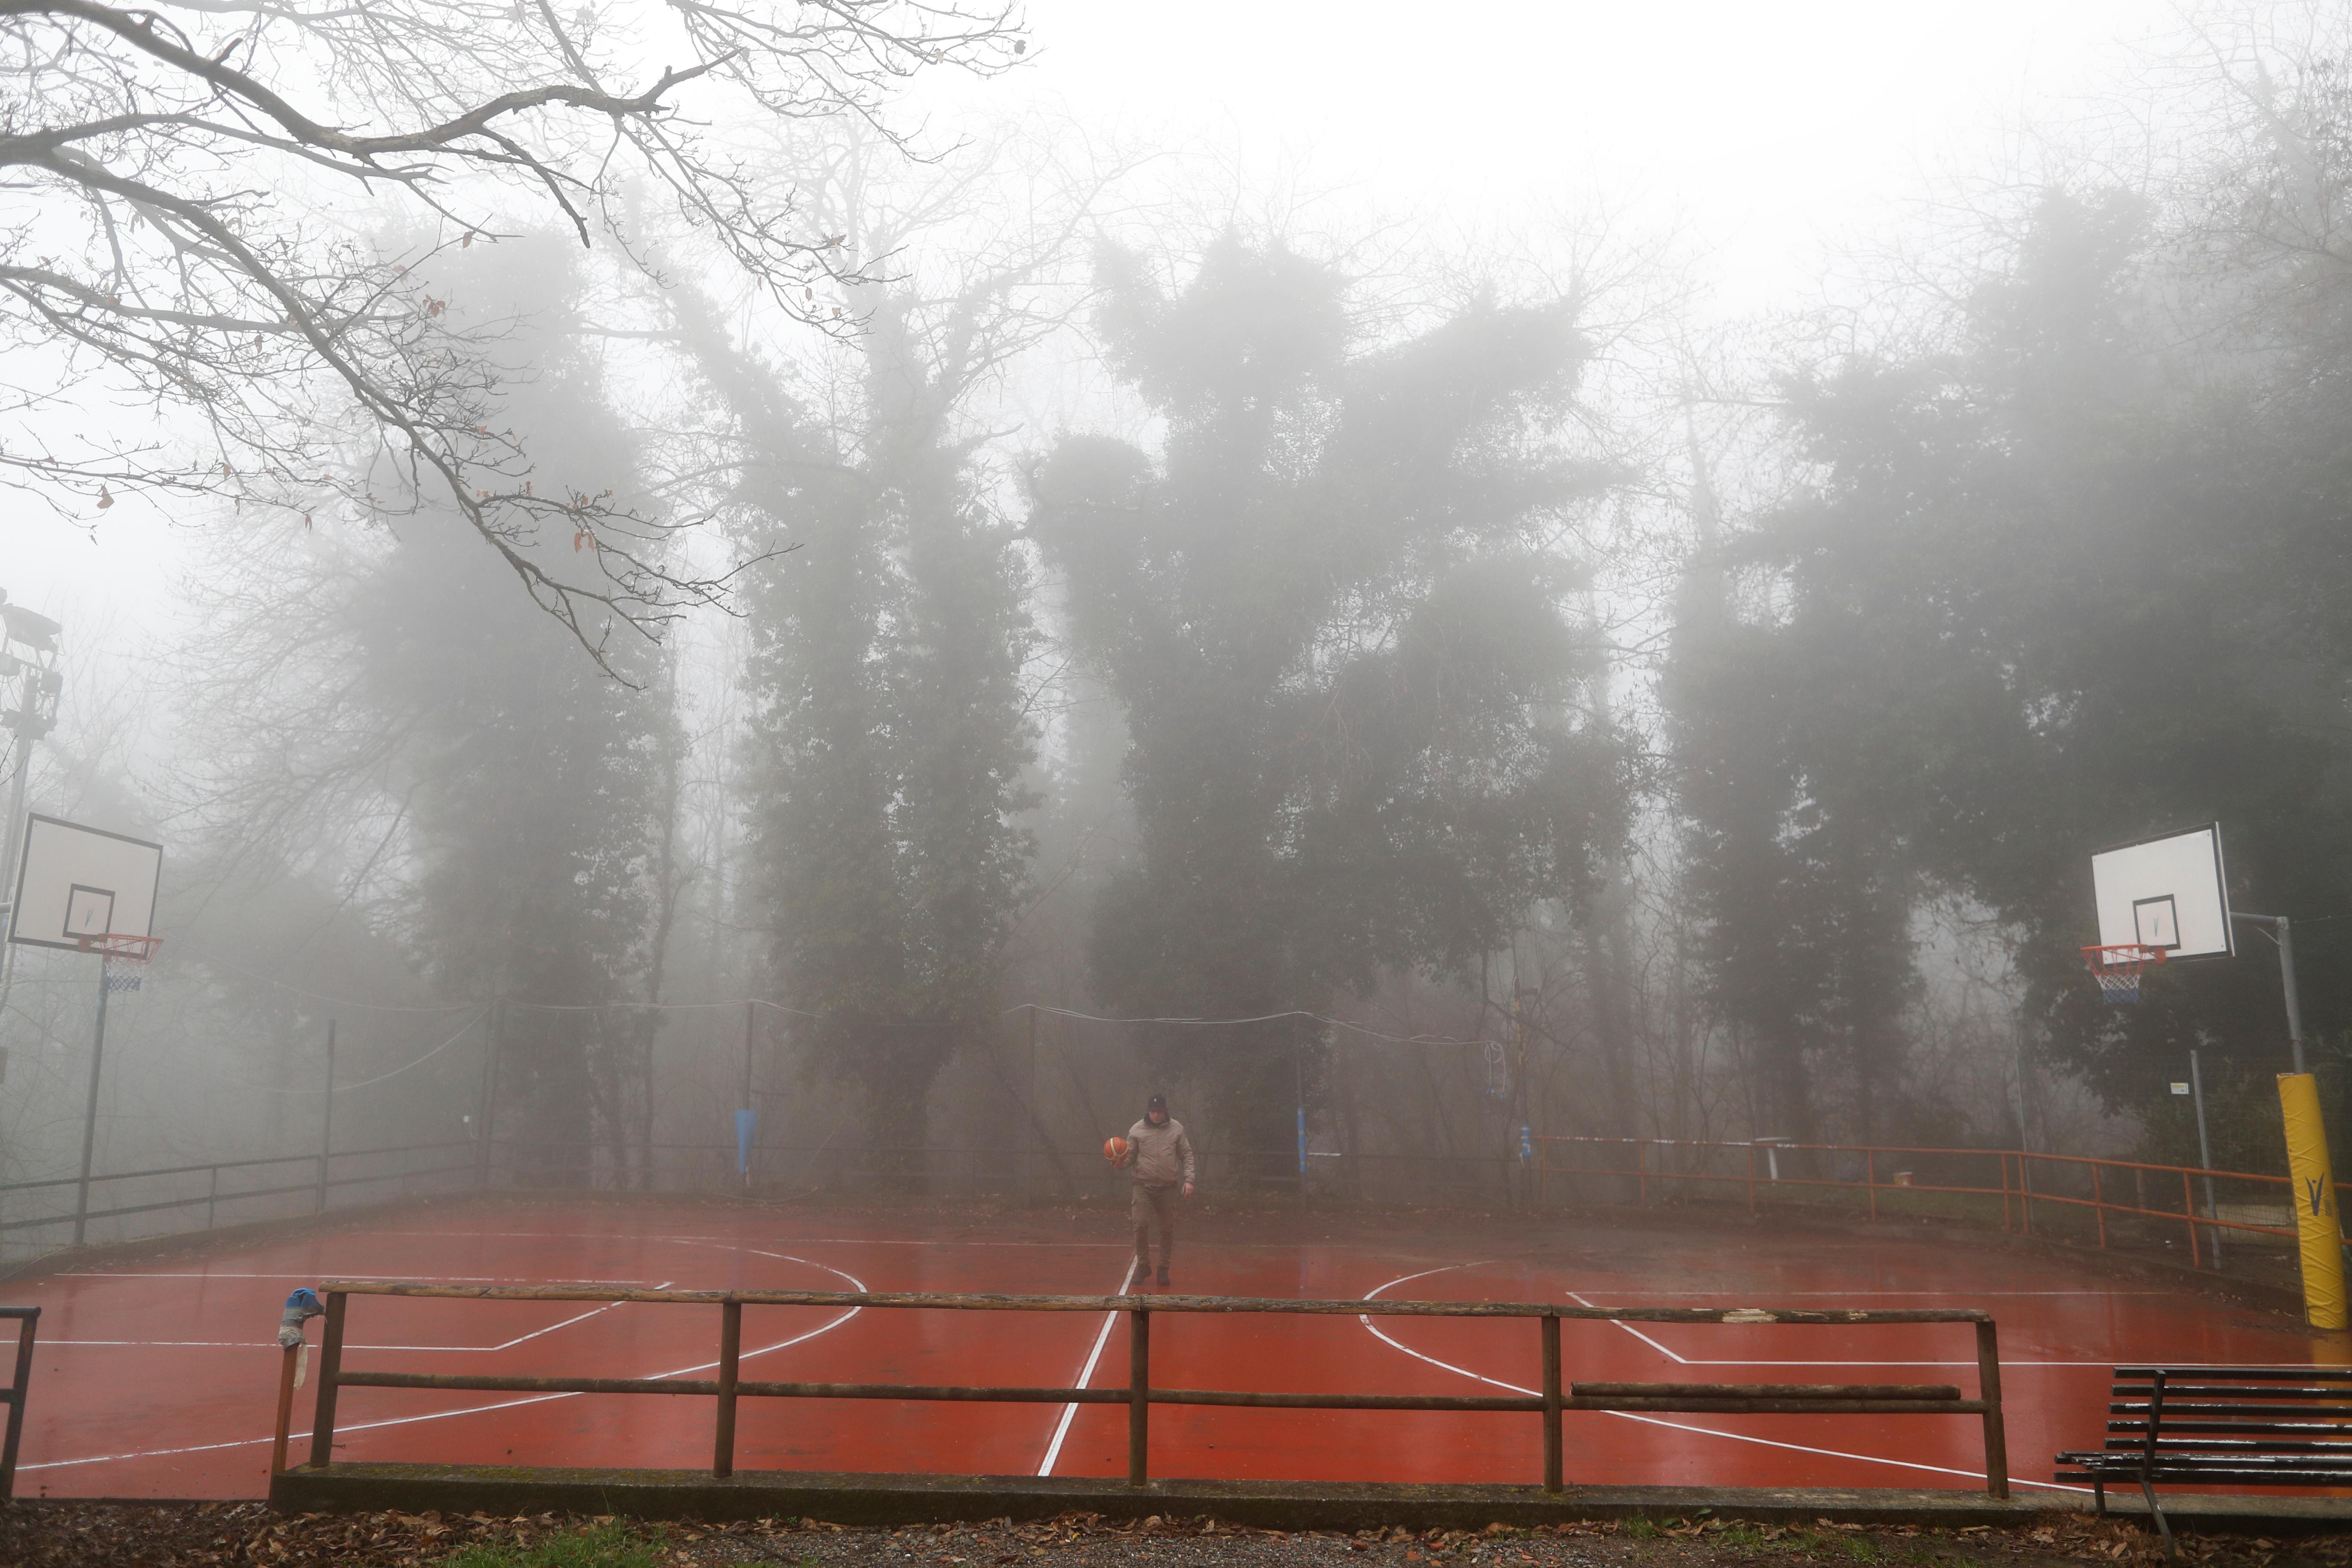 'He used to climb into the hoops': Kobe's Italian childhood home...